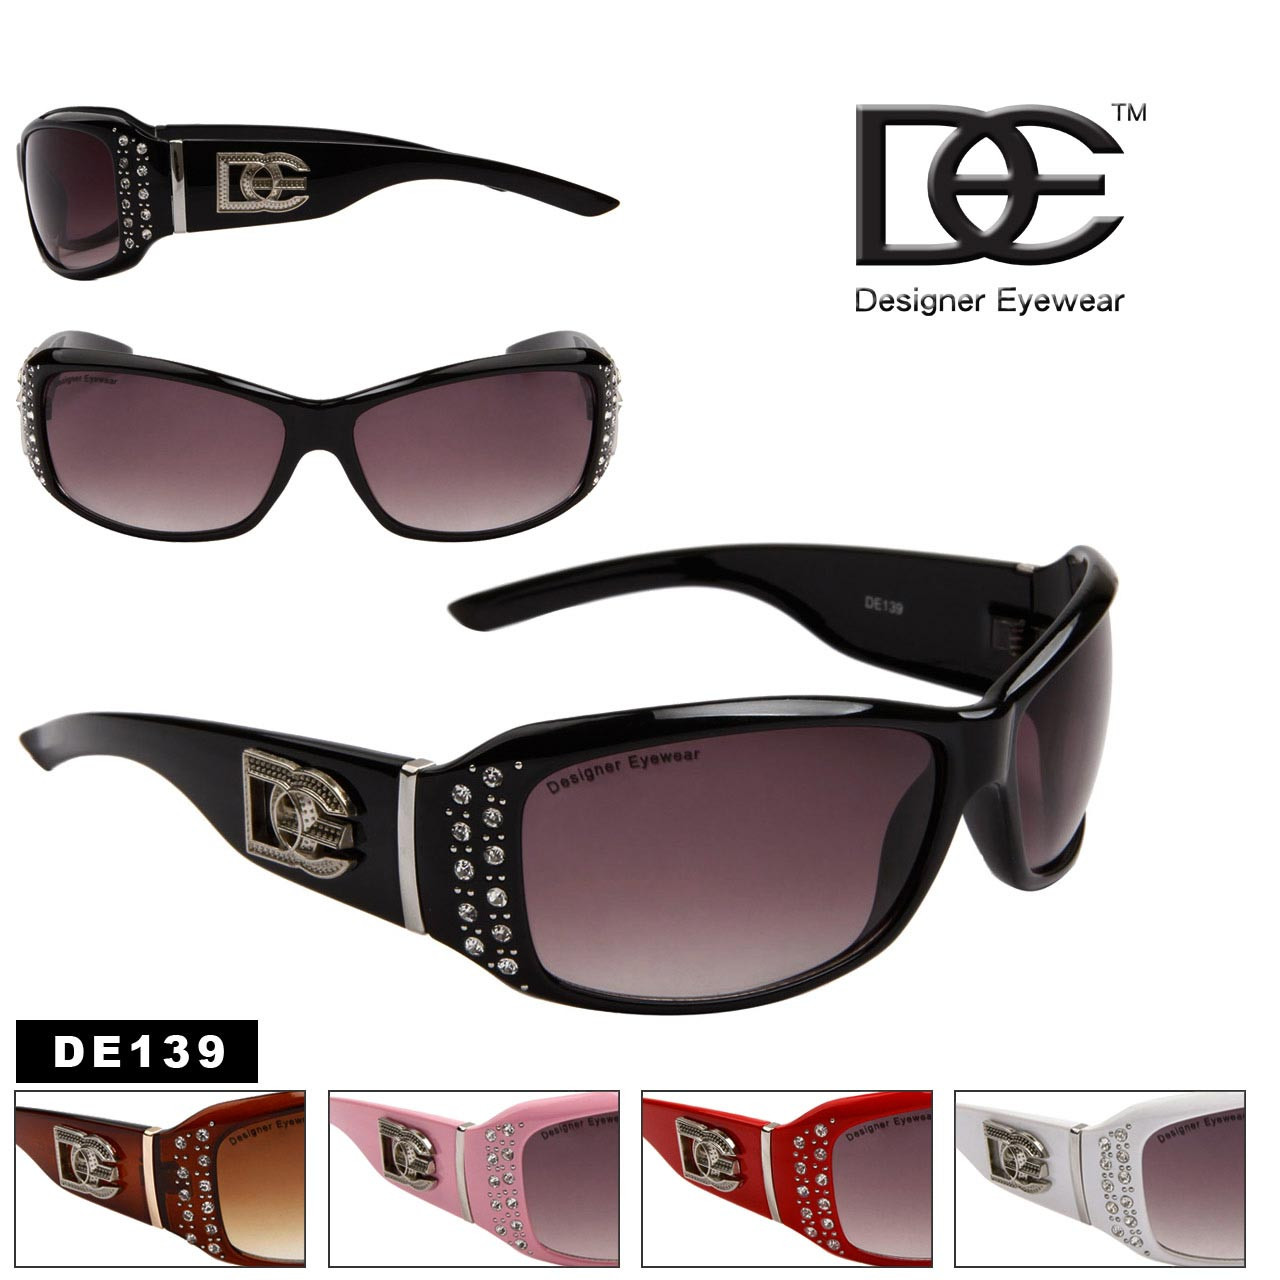 Designer Eyewear DE™139 Rhinestone Sunglasses